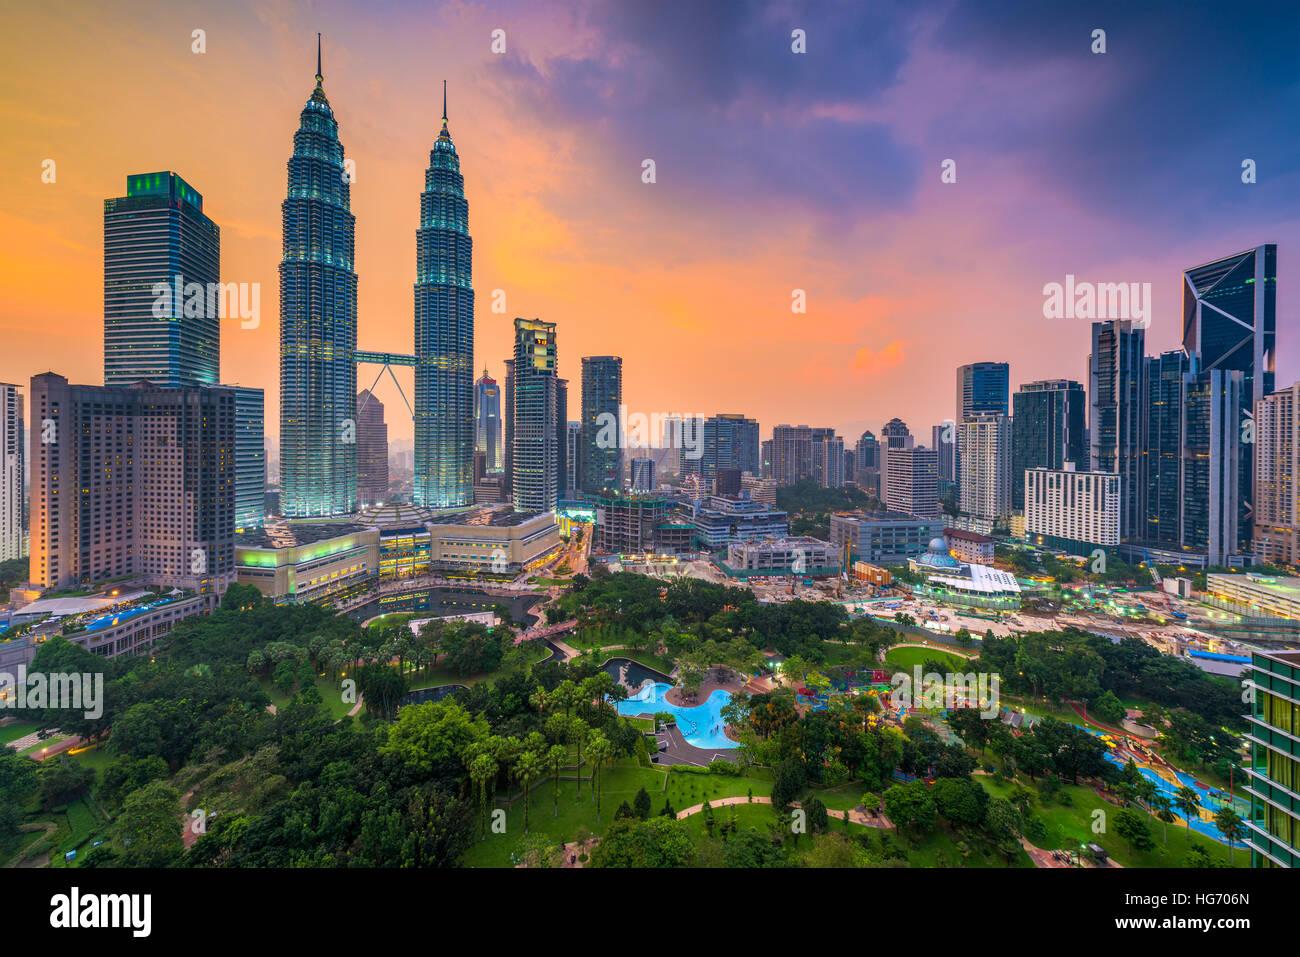 Kuala Lumpur, Malaisie skyline at Dusk sur le parc. Photo Stock